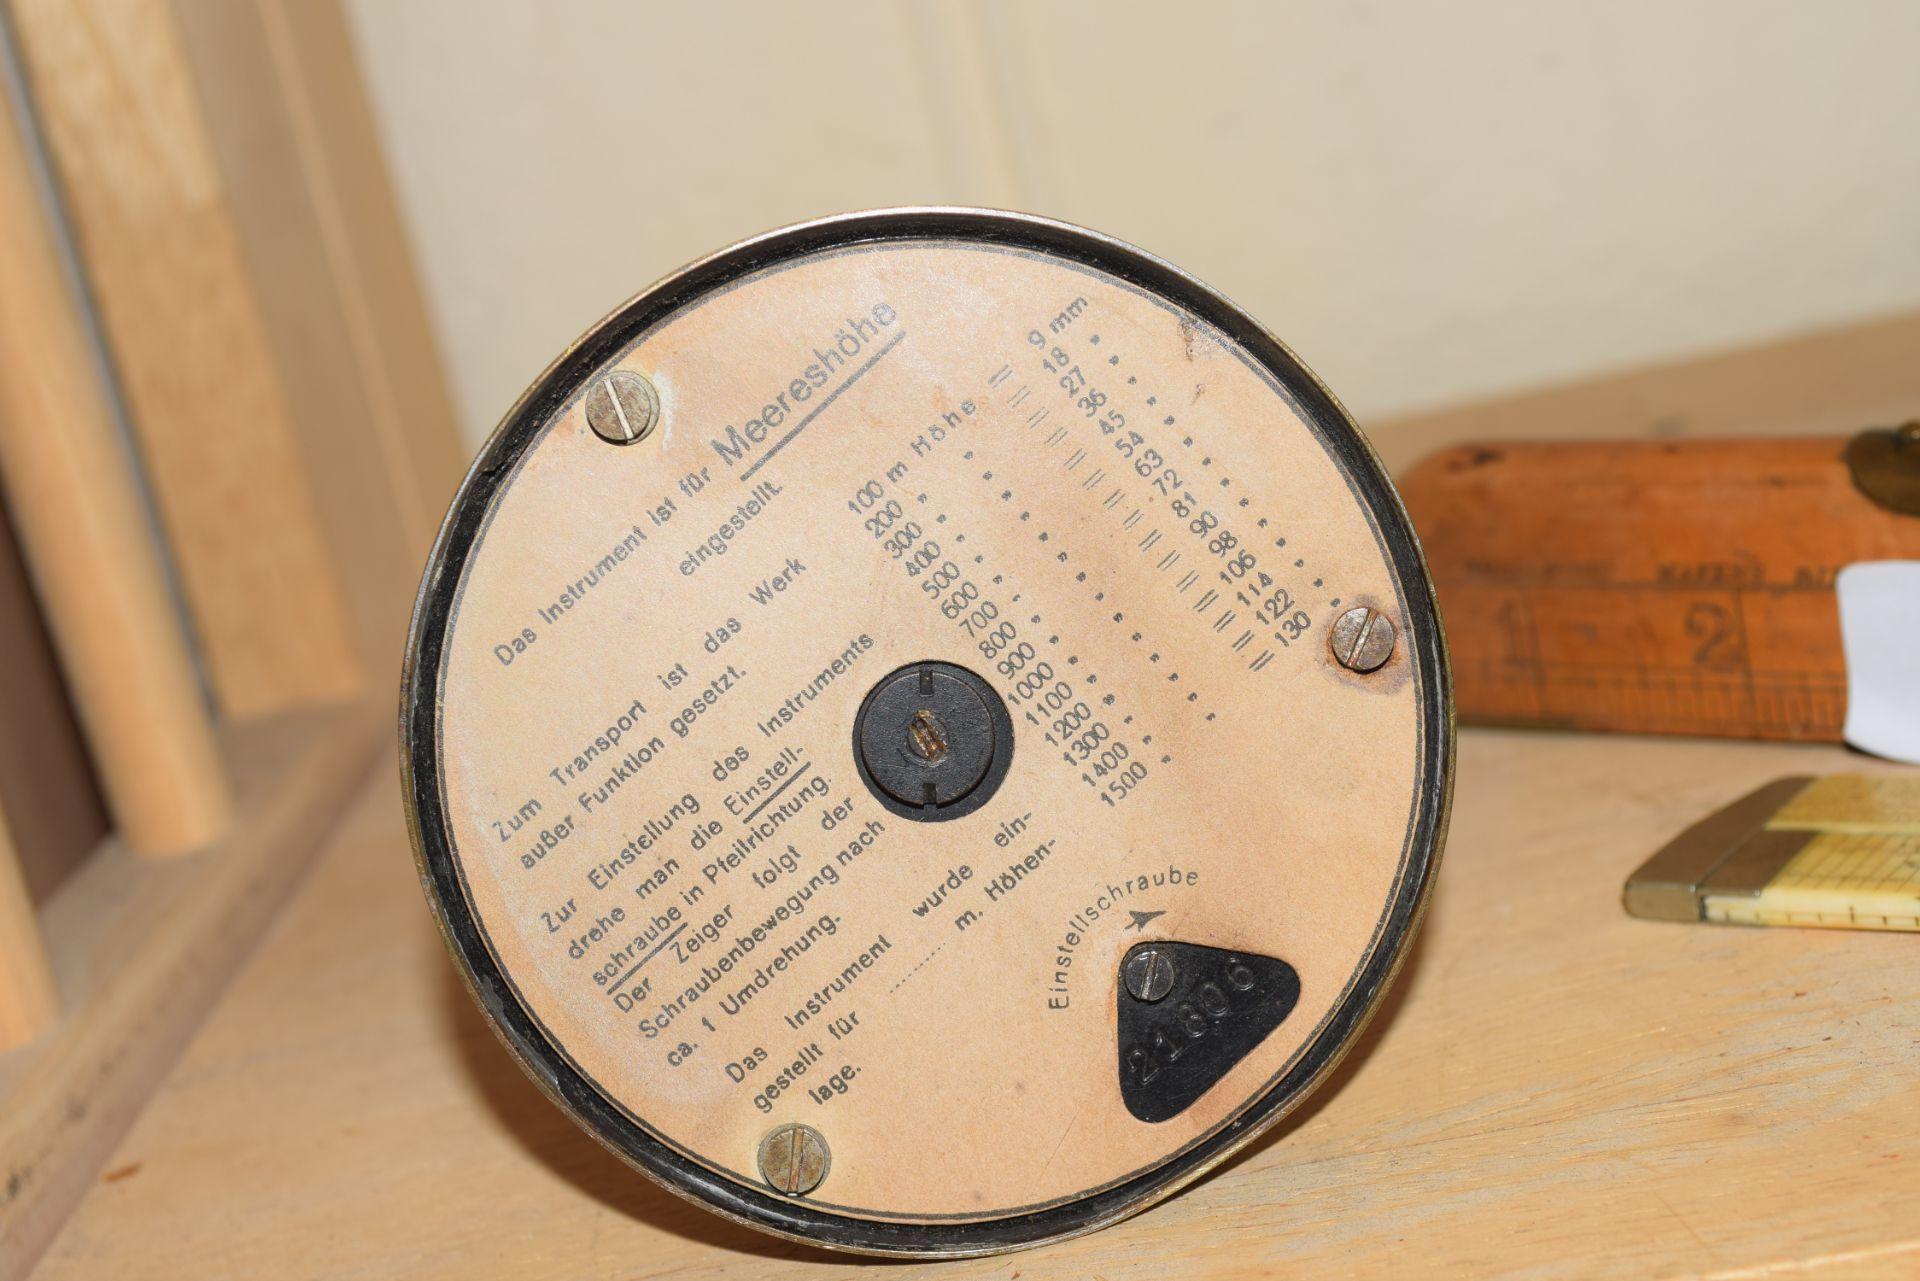 C P Goerz Berlin, early 20th century brass mounted desk barometer, 17cm high - Image 4 of 4